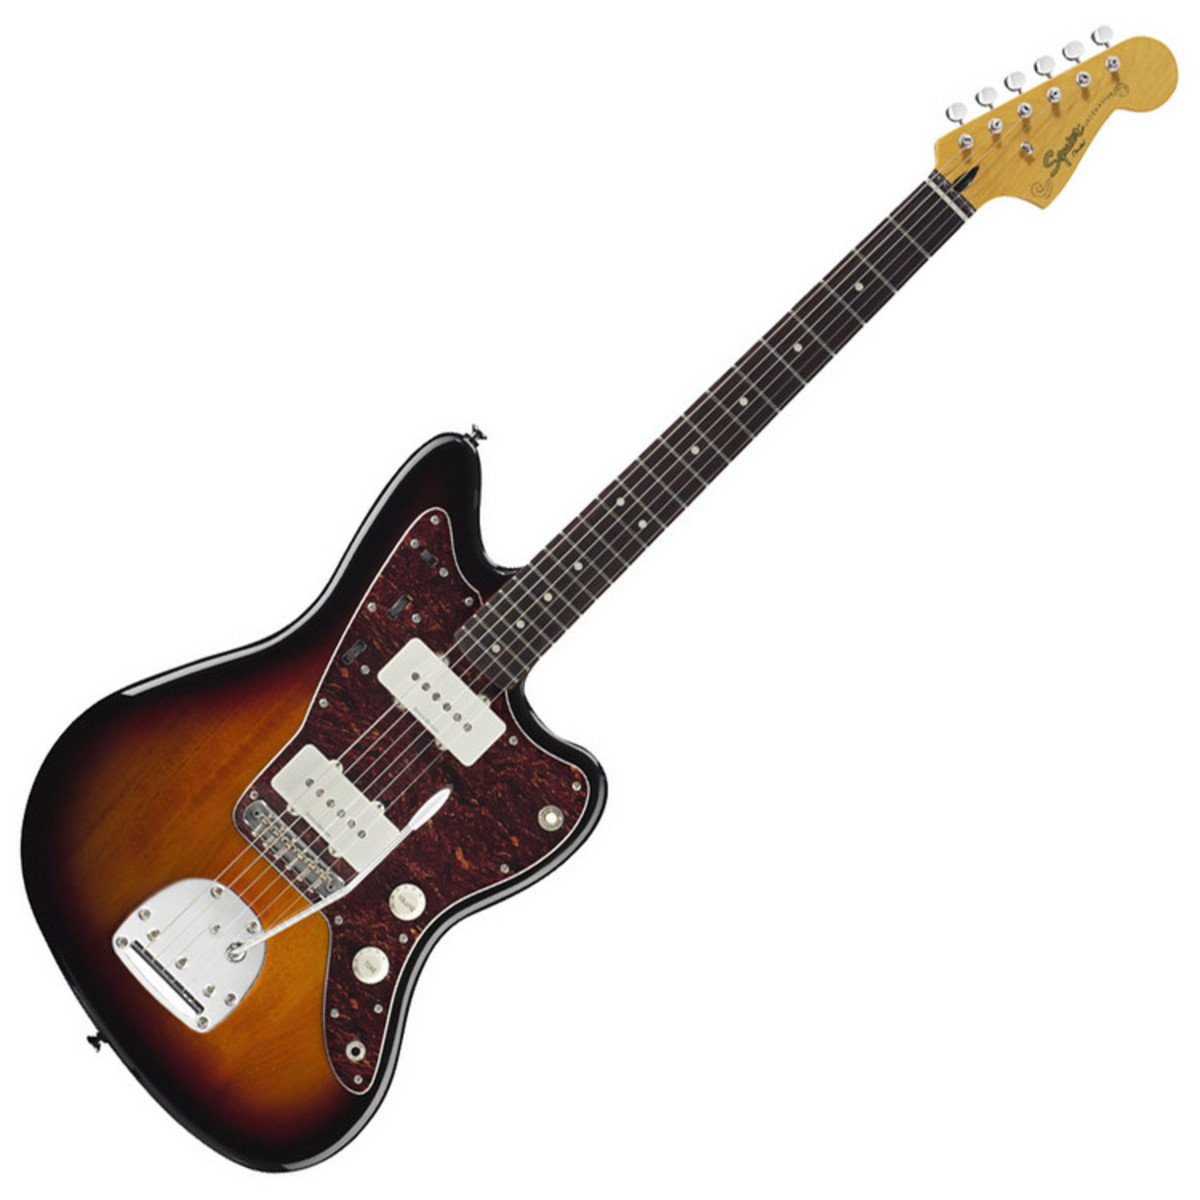 squier by fender vintage modified jazzmaster guitar 3 color sunburst box opened at gear4music. Black Bedroom Furniture Sets. Home Design Ideas